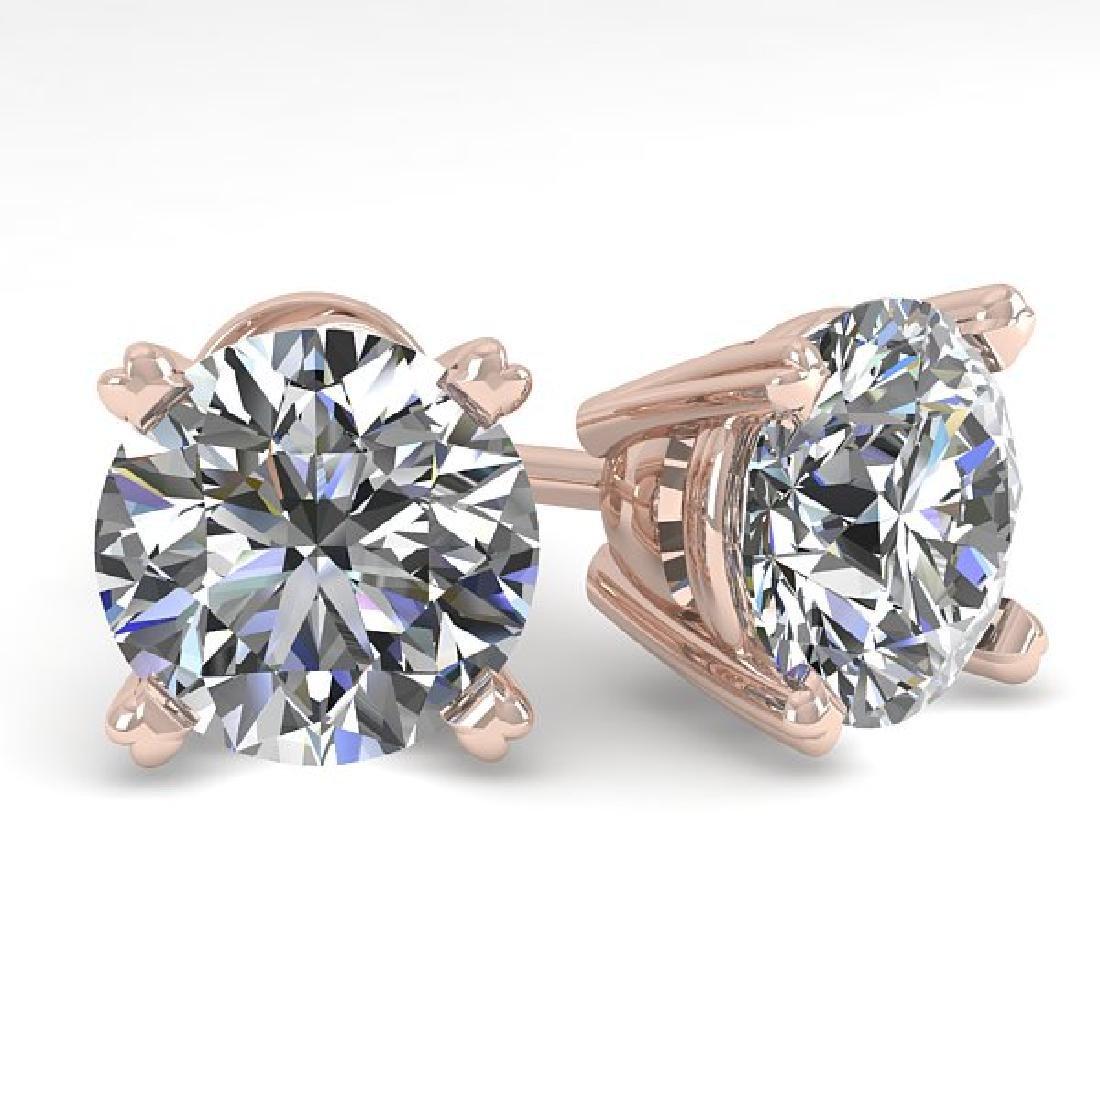 2.53 CTW Certified VS/SI Diamond Stud Earrings 18K Rose